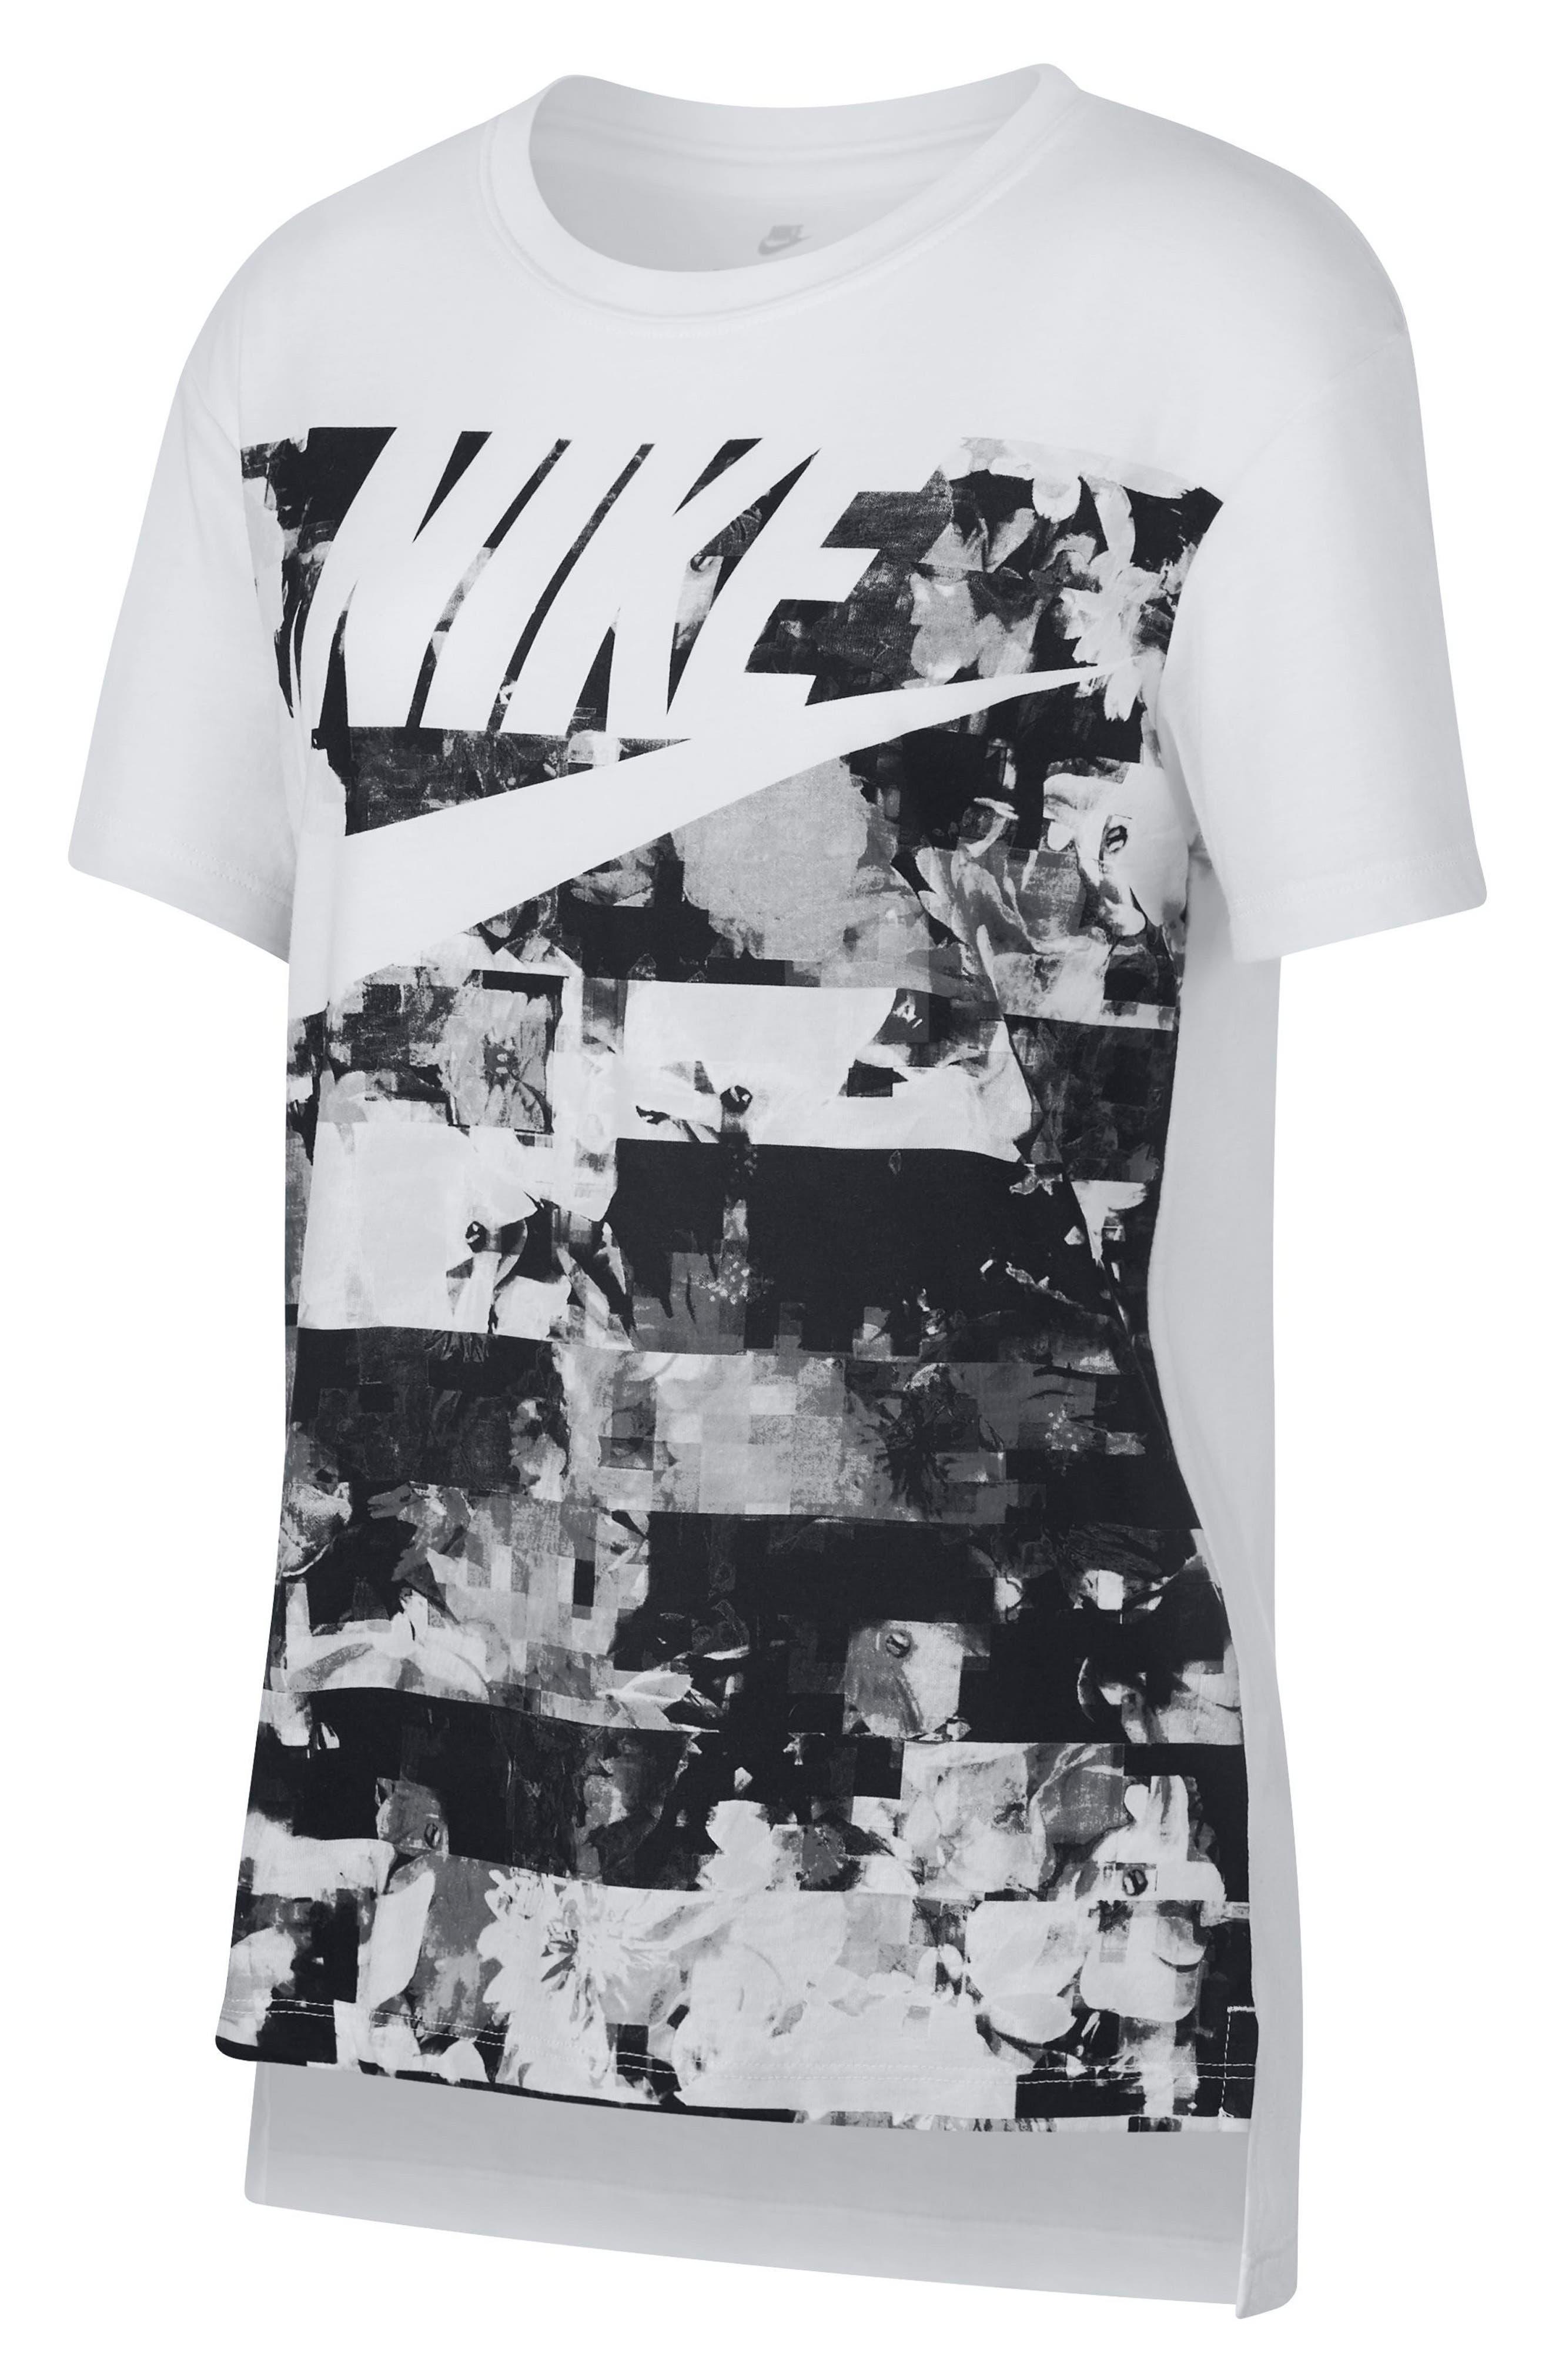 Alternate Image 1 Selected - Nike Hyperfade Graphic Tee (Big Girls)